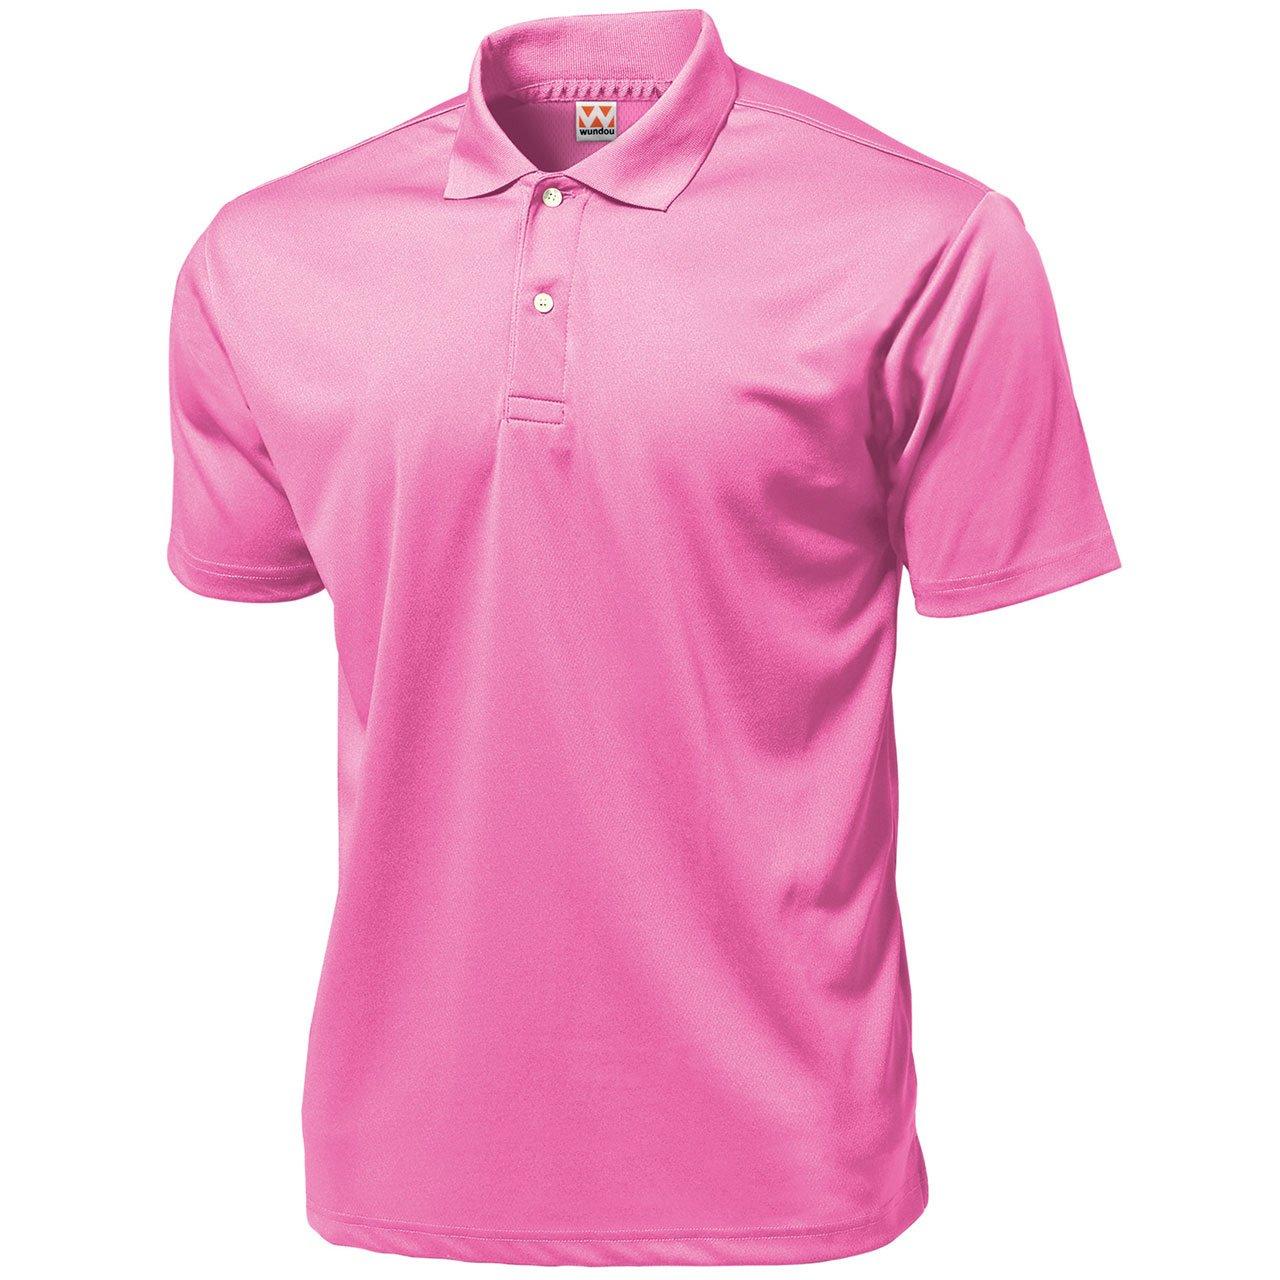 ?Pink 59 Wundou Boys Sports Dry Light Polo-Shirts P335?150CM